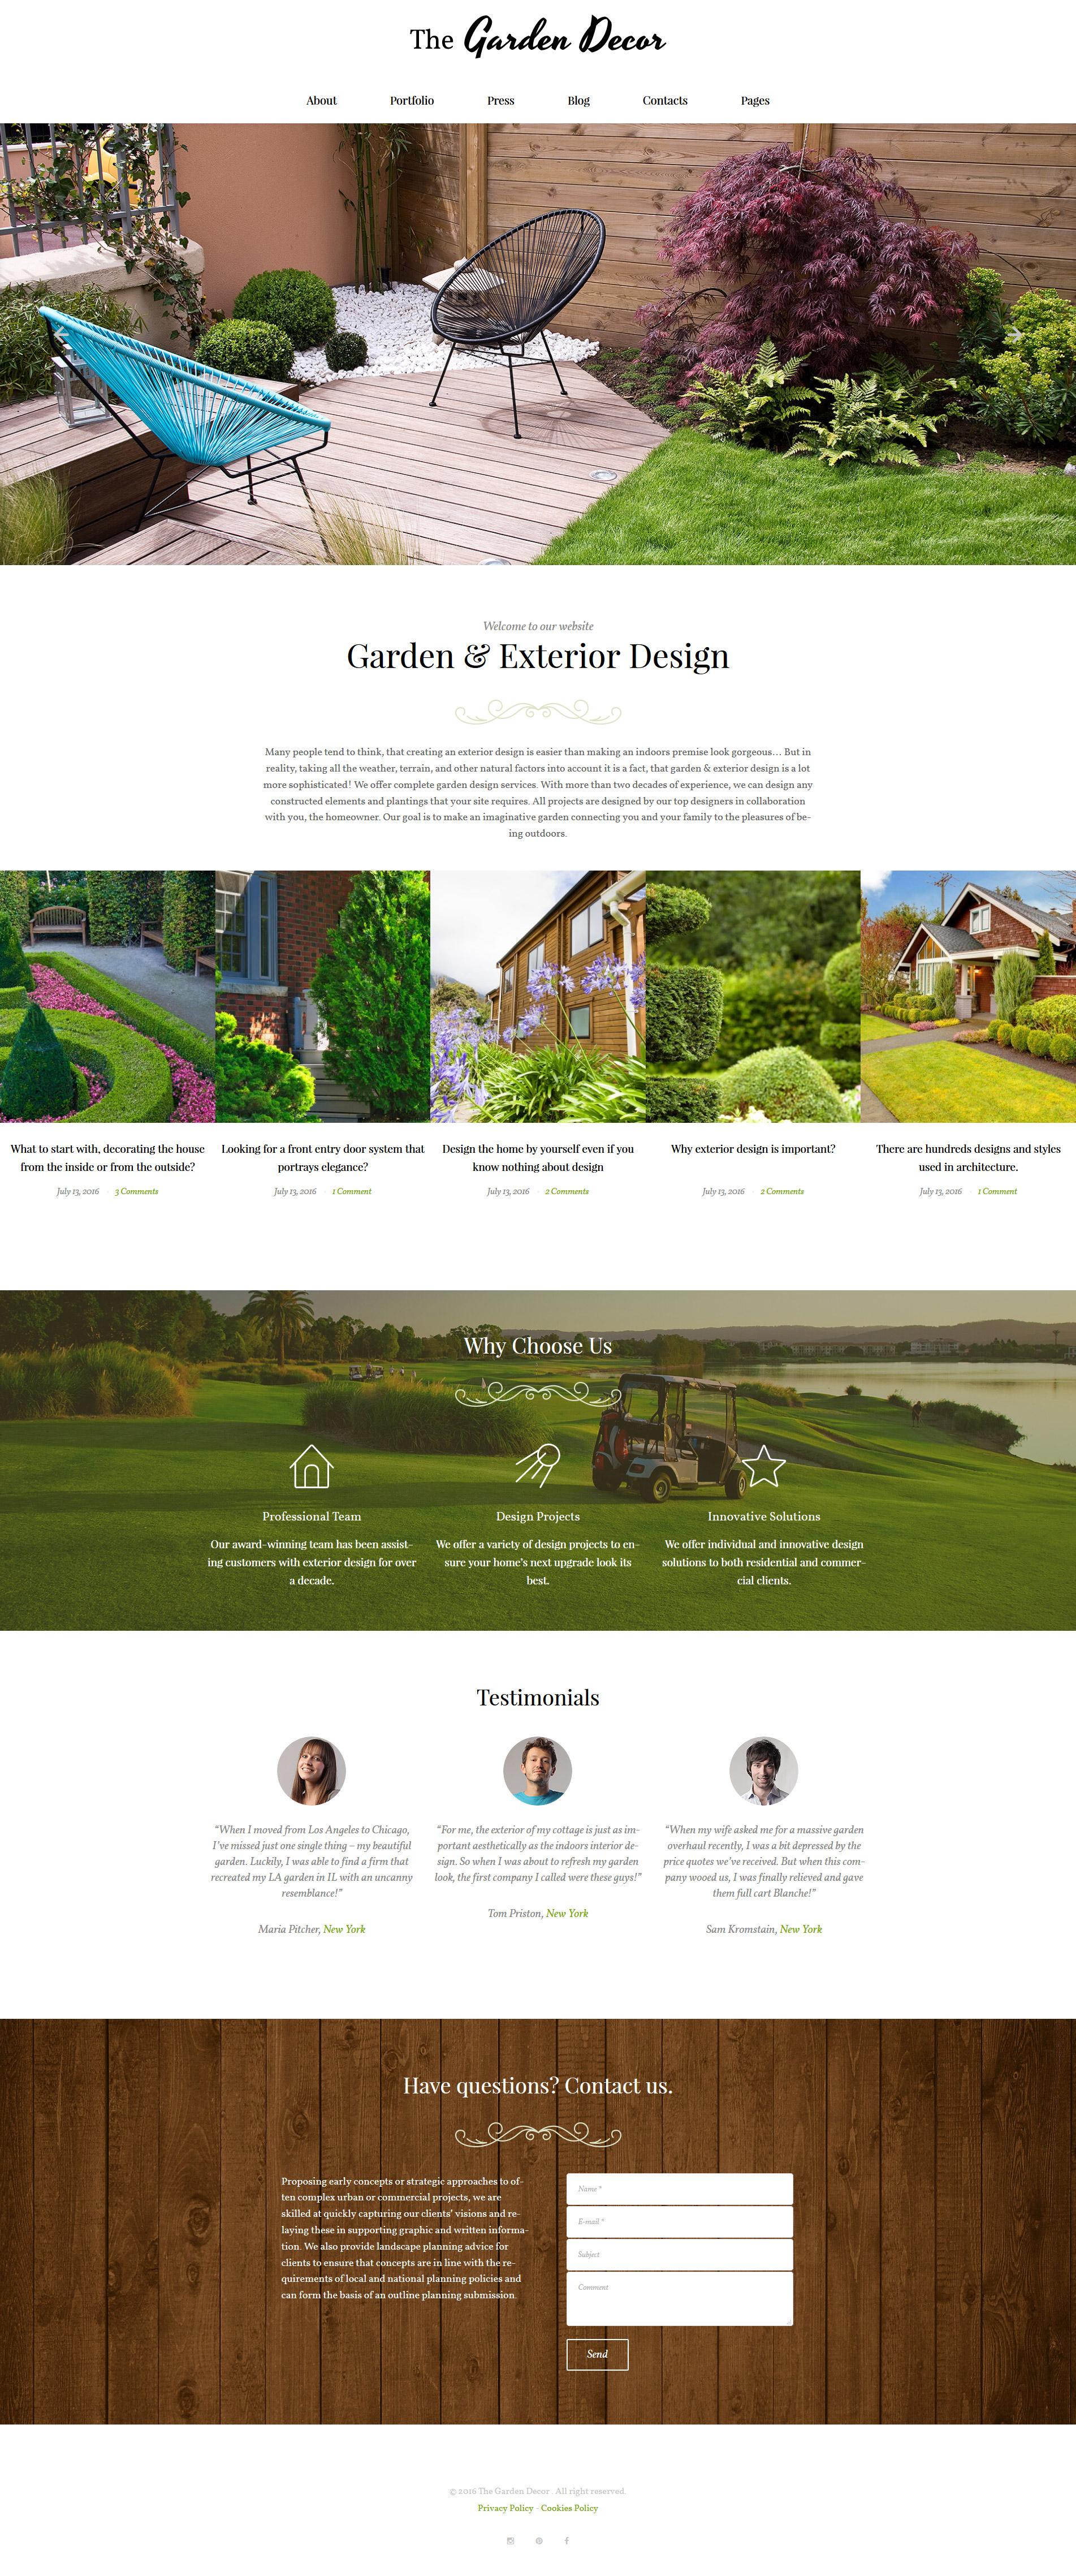 Reszponzív Garden Decor And Exterior Design Responsive WordPress sablon 62020